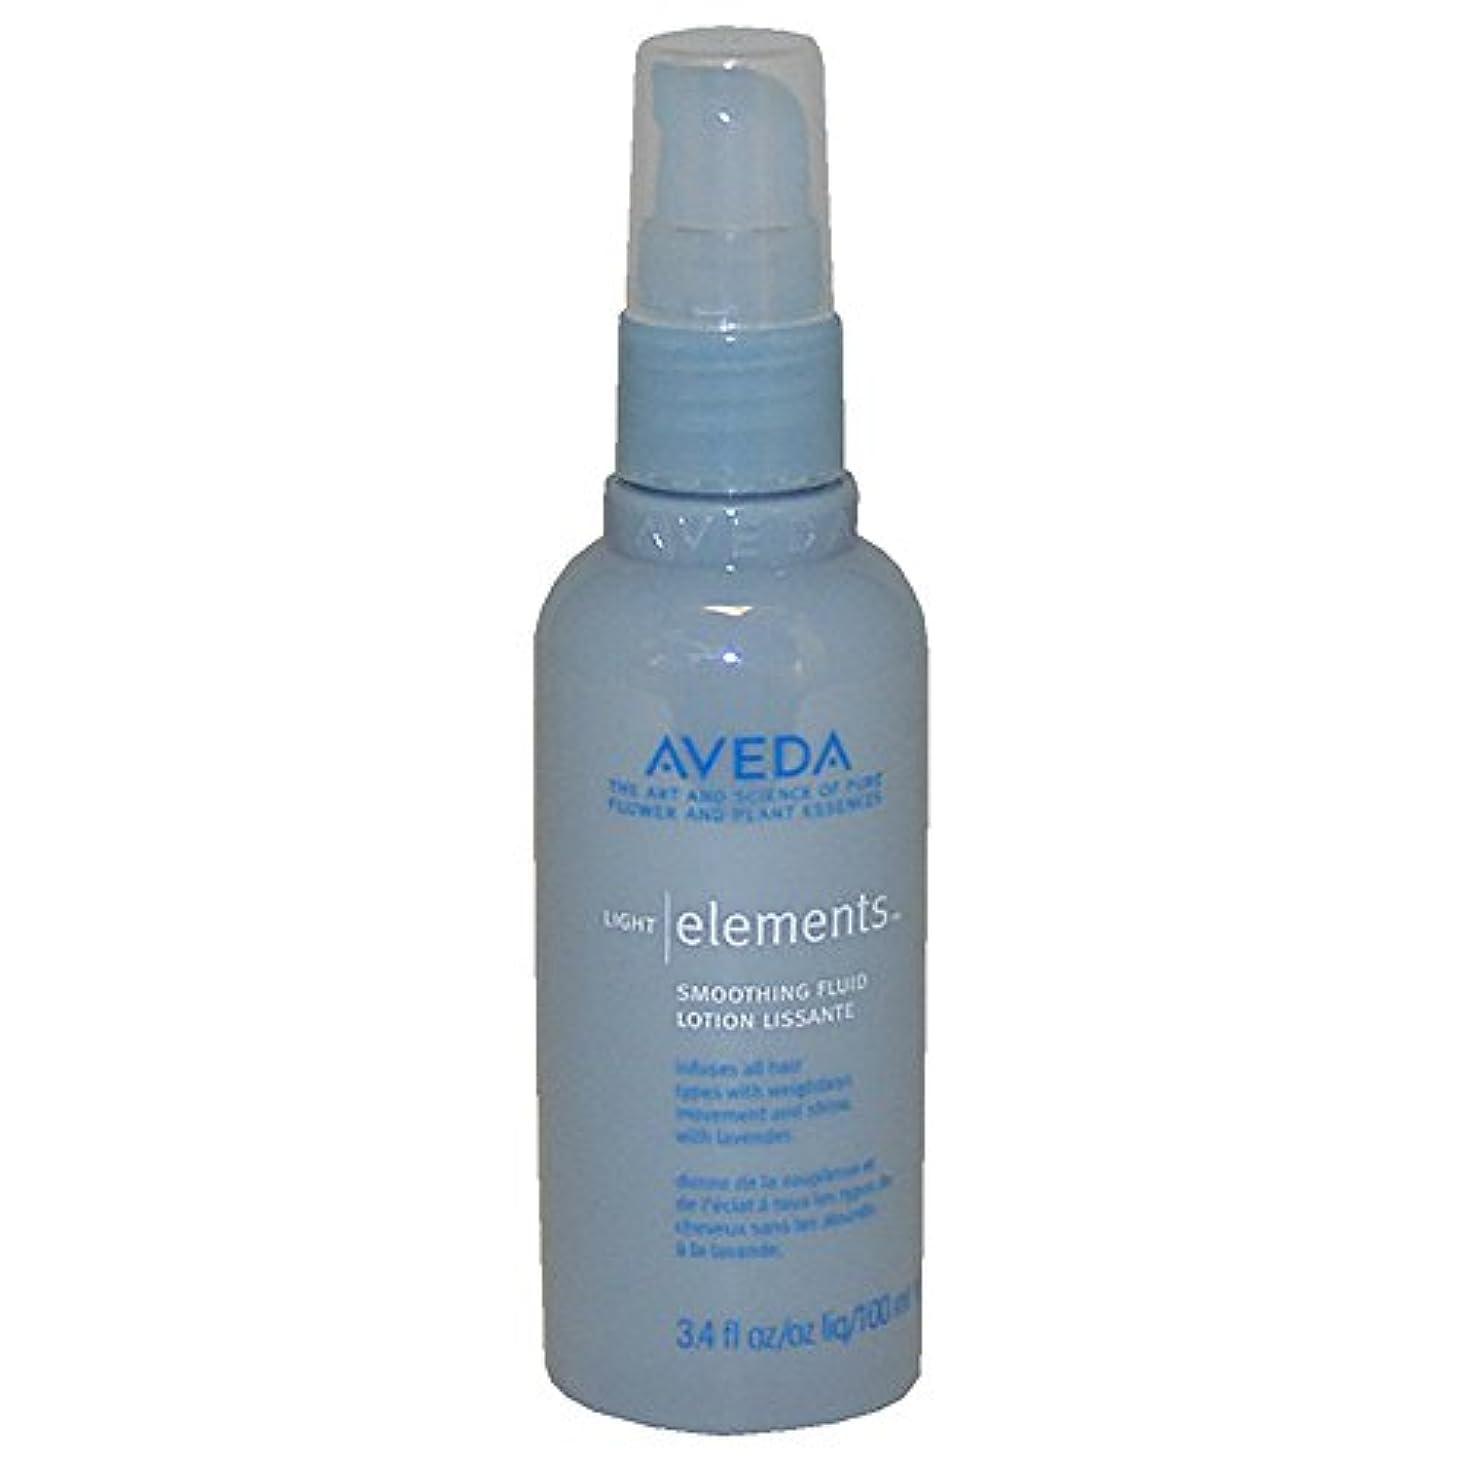 Aveda Light Elements Smoothing Fluid 100ml [並行輸入品]